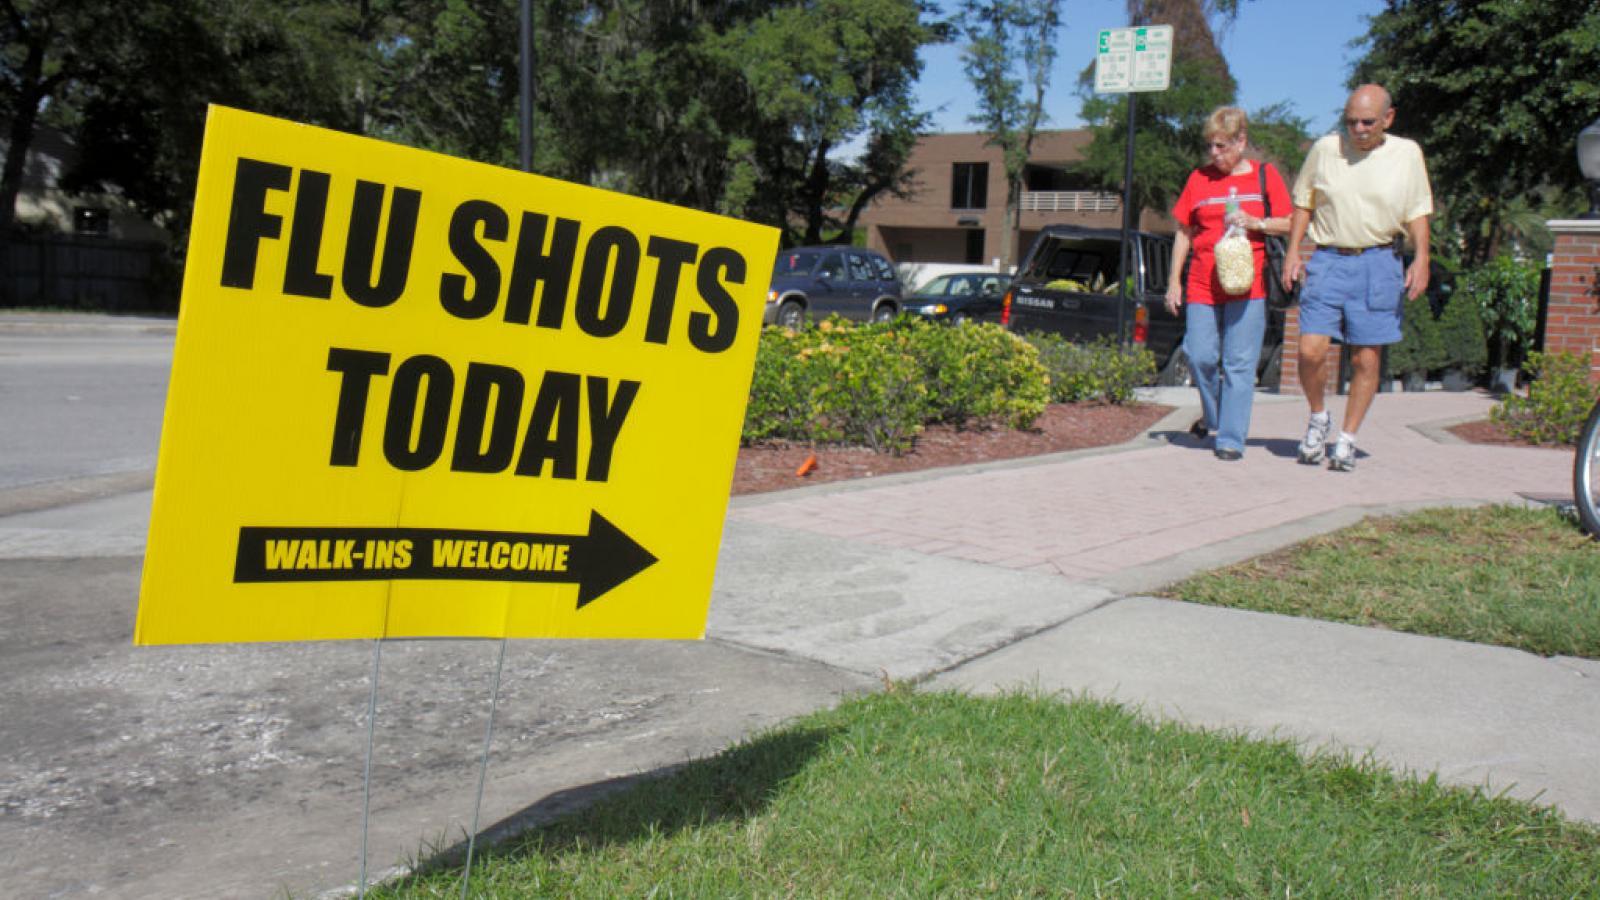 Flu shot sign in Winter Park, FL